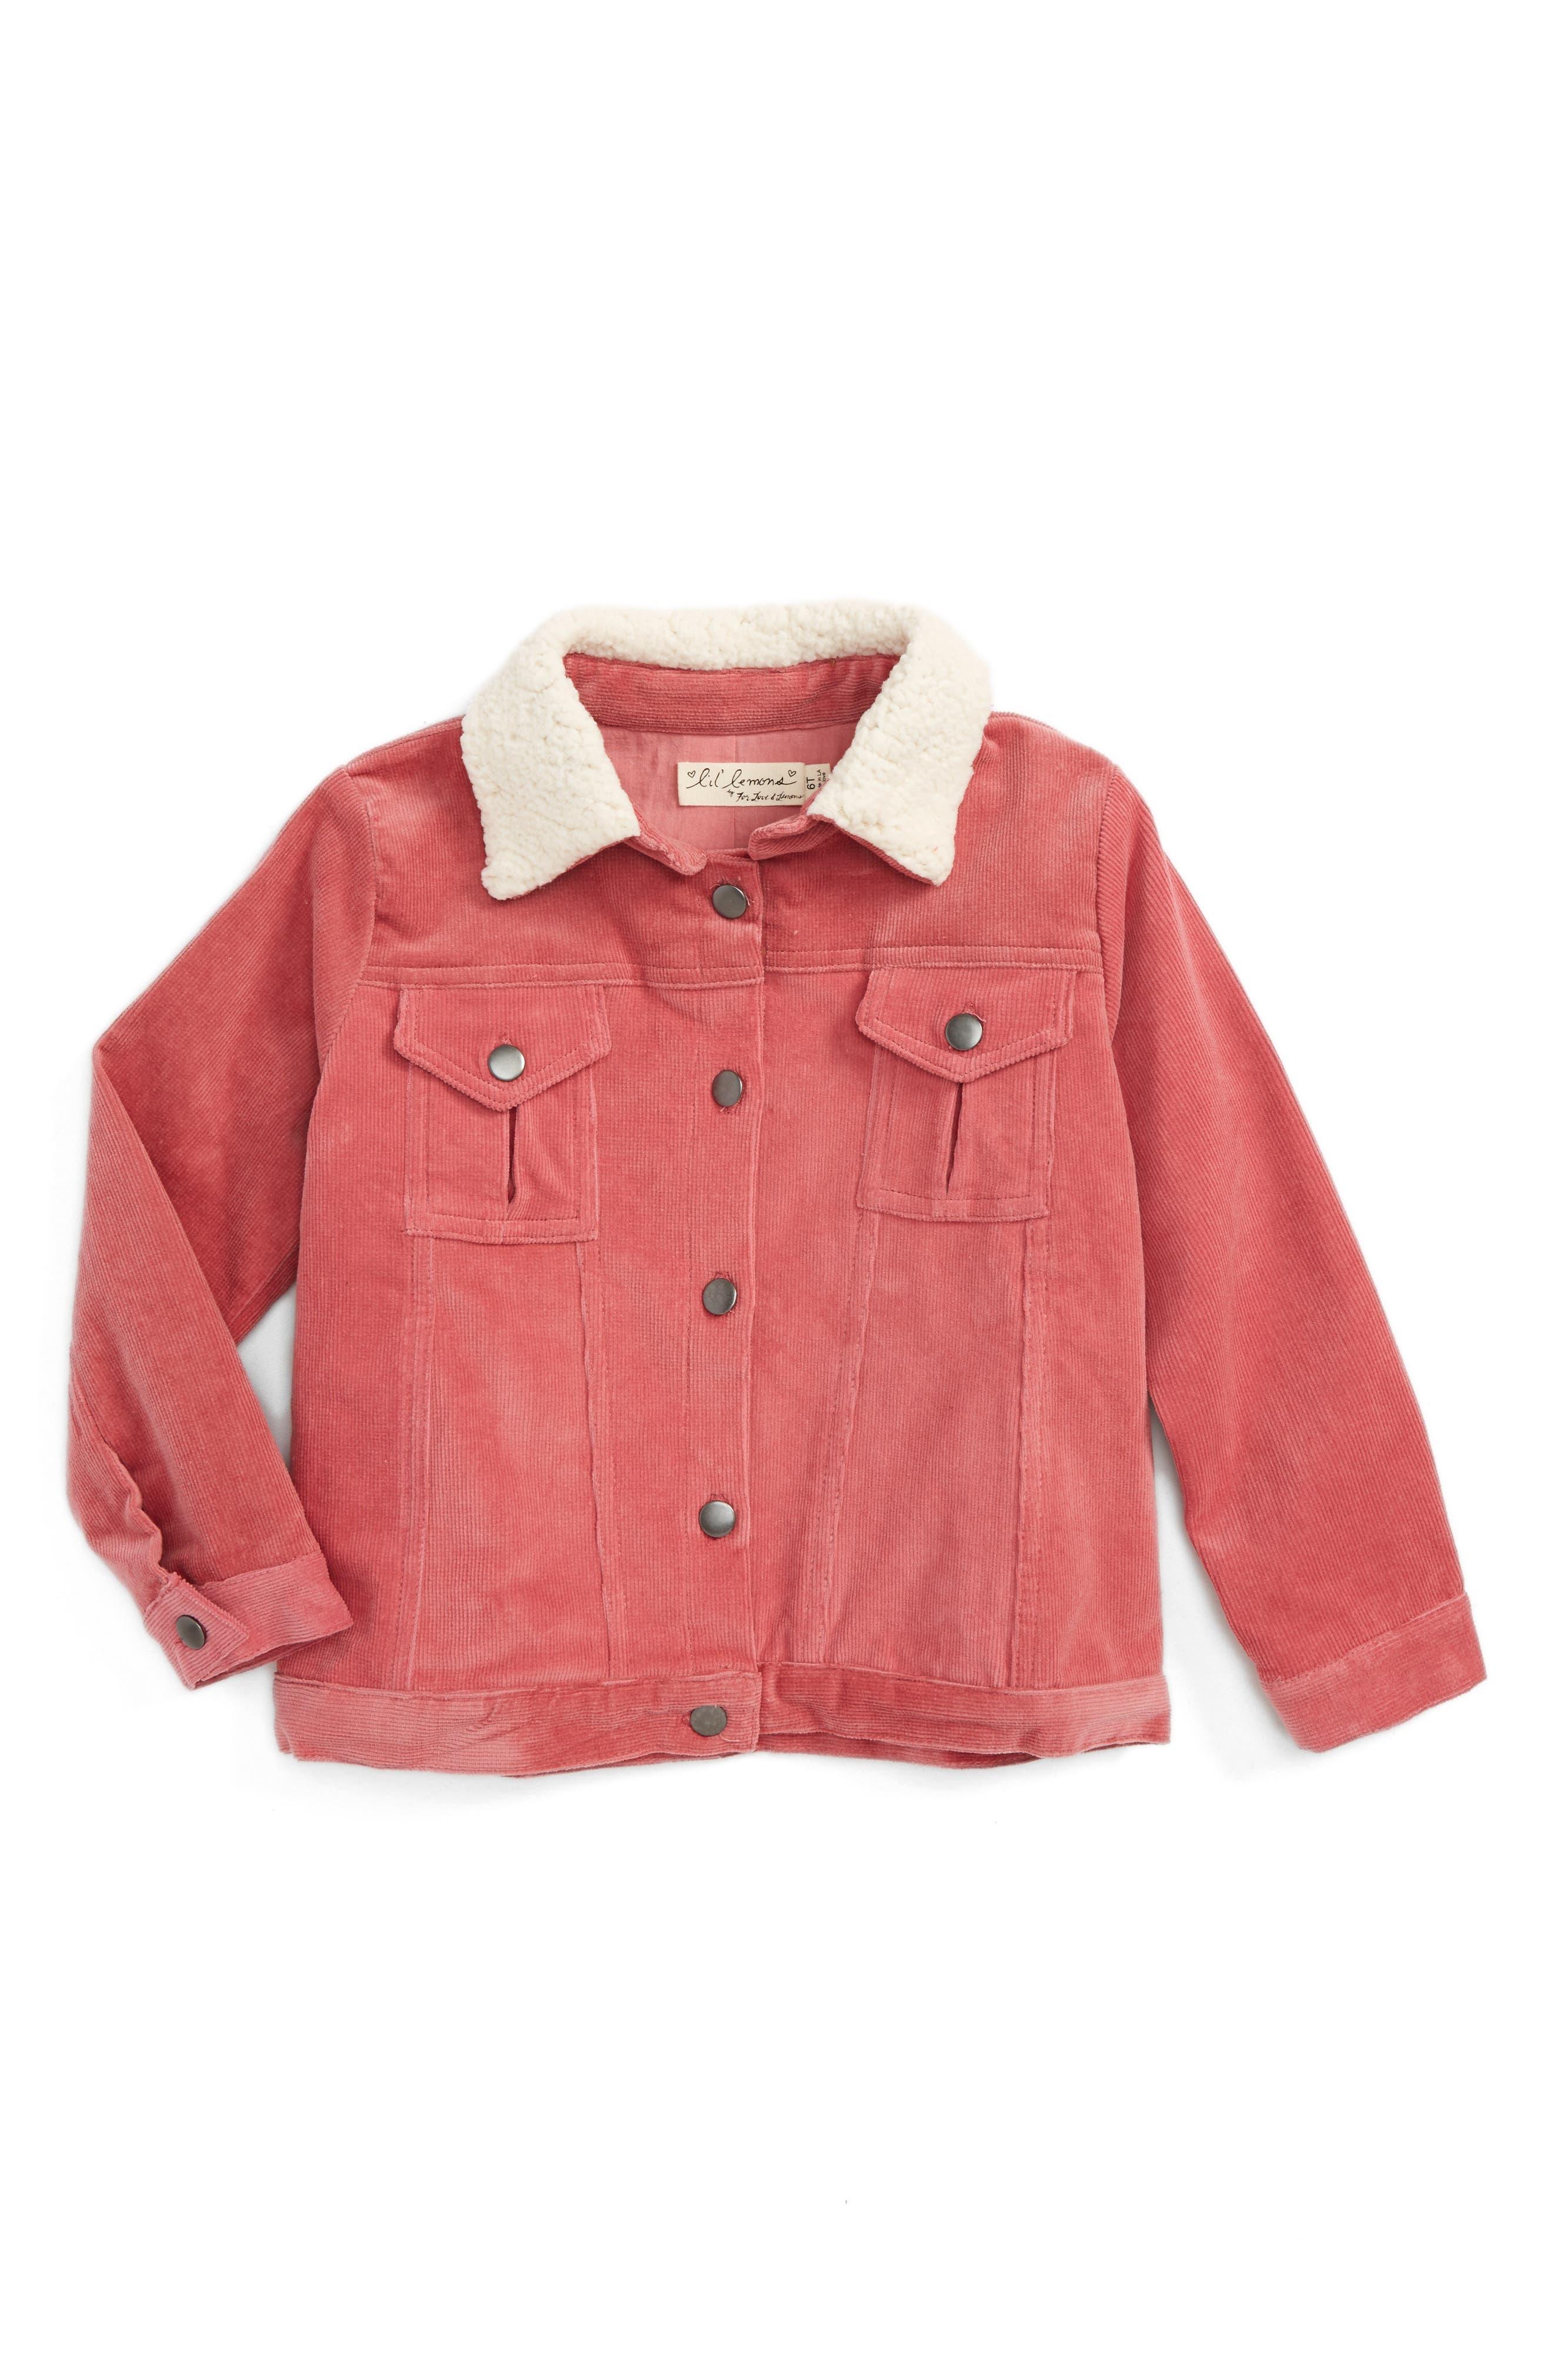 Corduroy Jacket,                             Main thumbnail 1, color,                             650